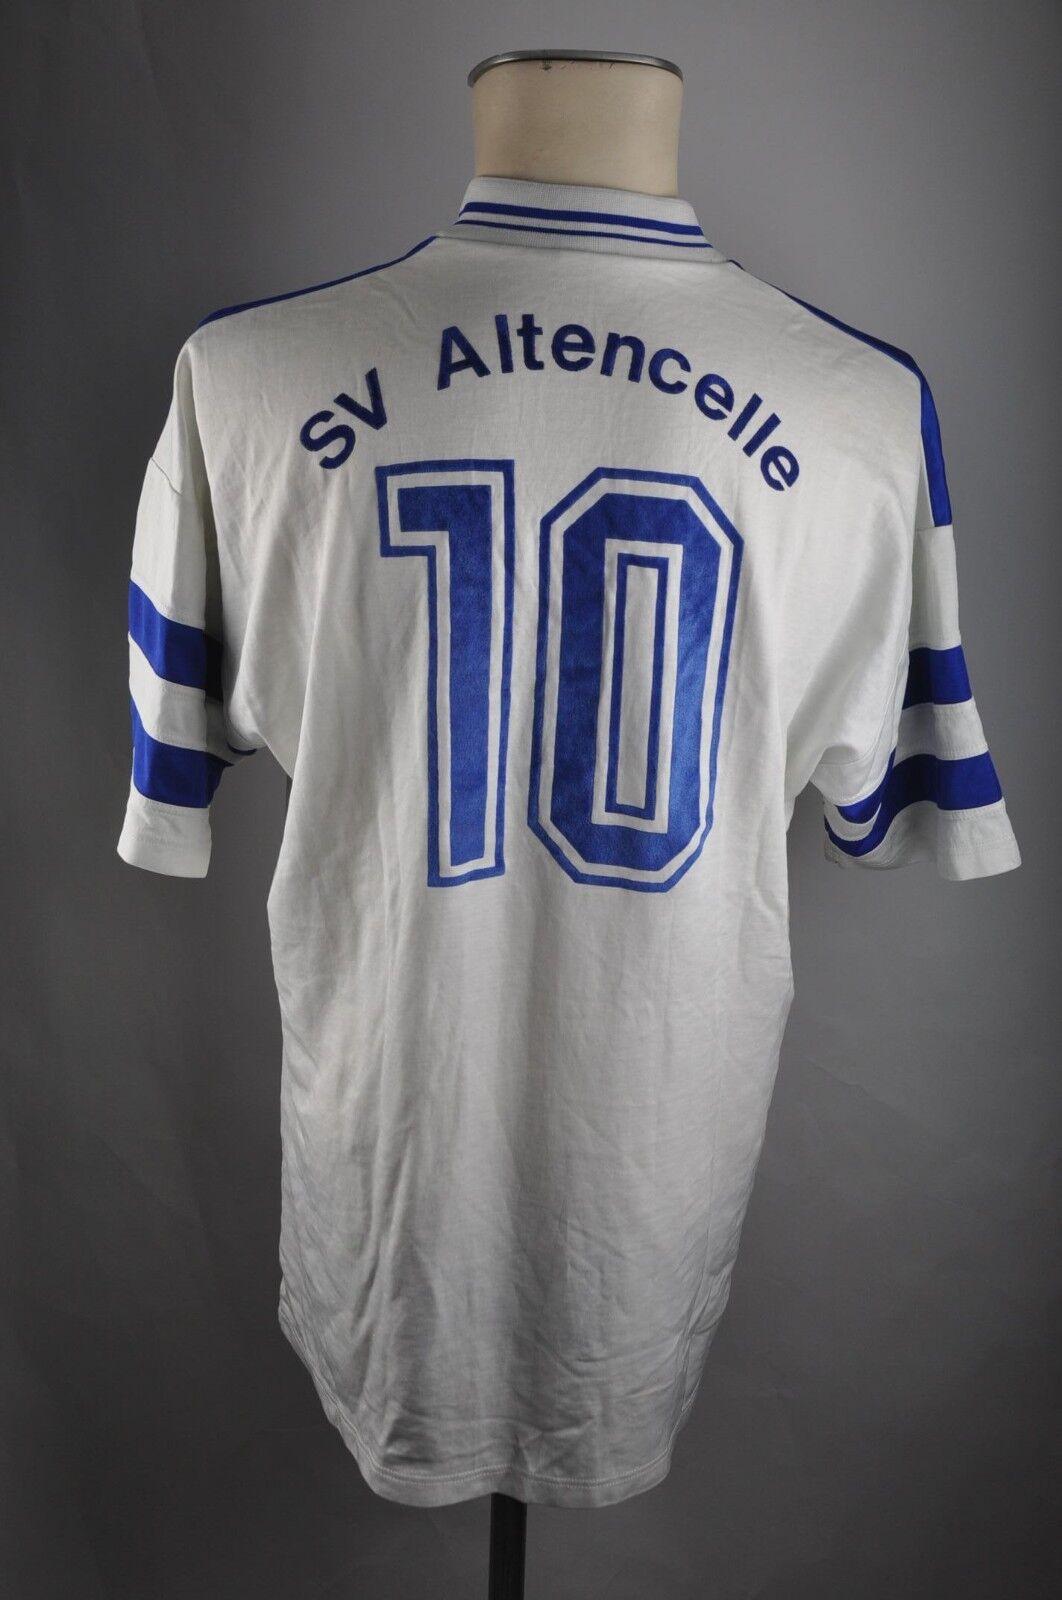 Erima vintage Trikot Altencelle SV Altencelle Trikot  10 90er Shirt Gr. XL weiß 90s jersey VG1 449850